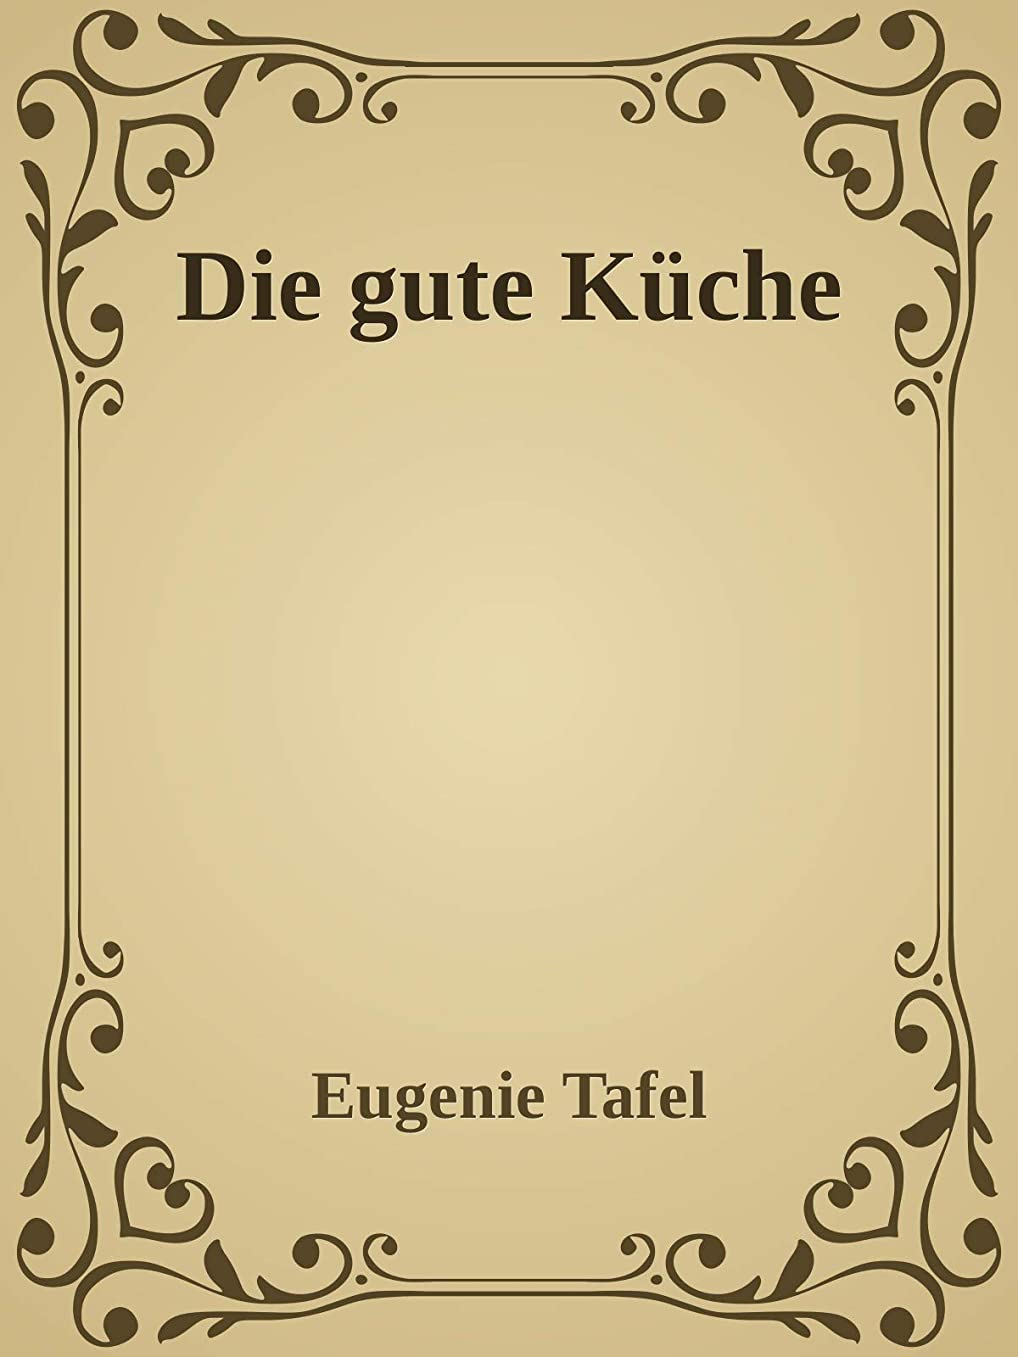 インペリアル相手該当するDie gute Küche: Praktisches Kochbuch für den einfachen und feineren Haushalt. (German Edition)